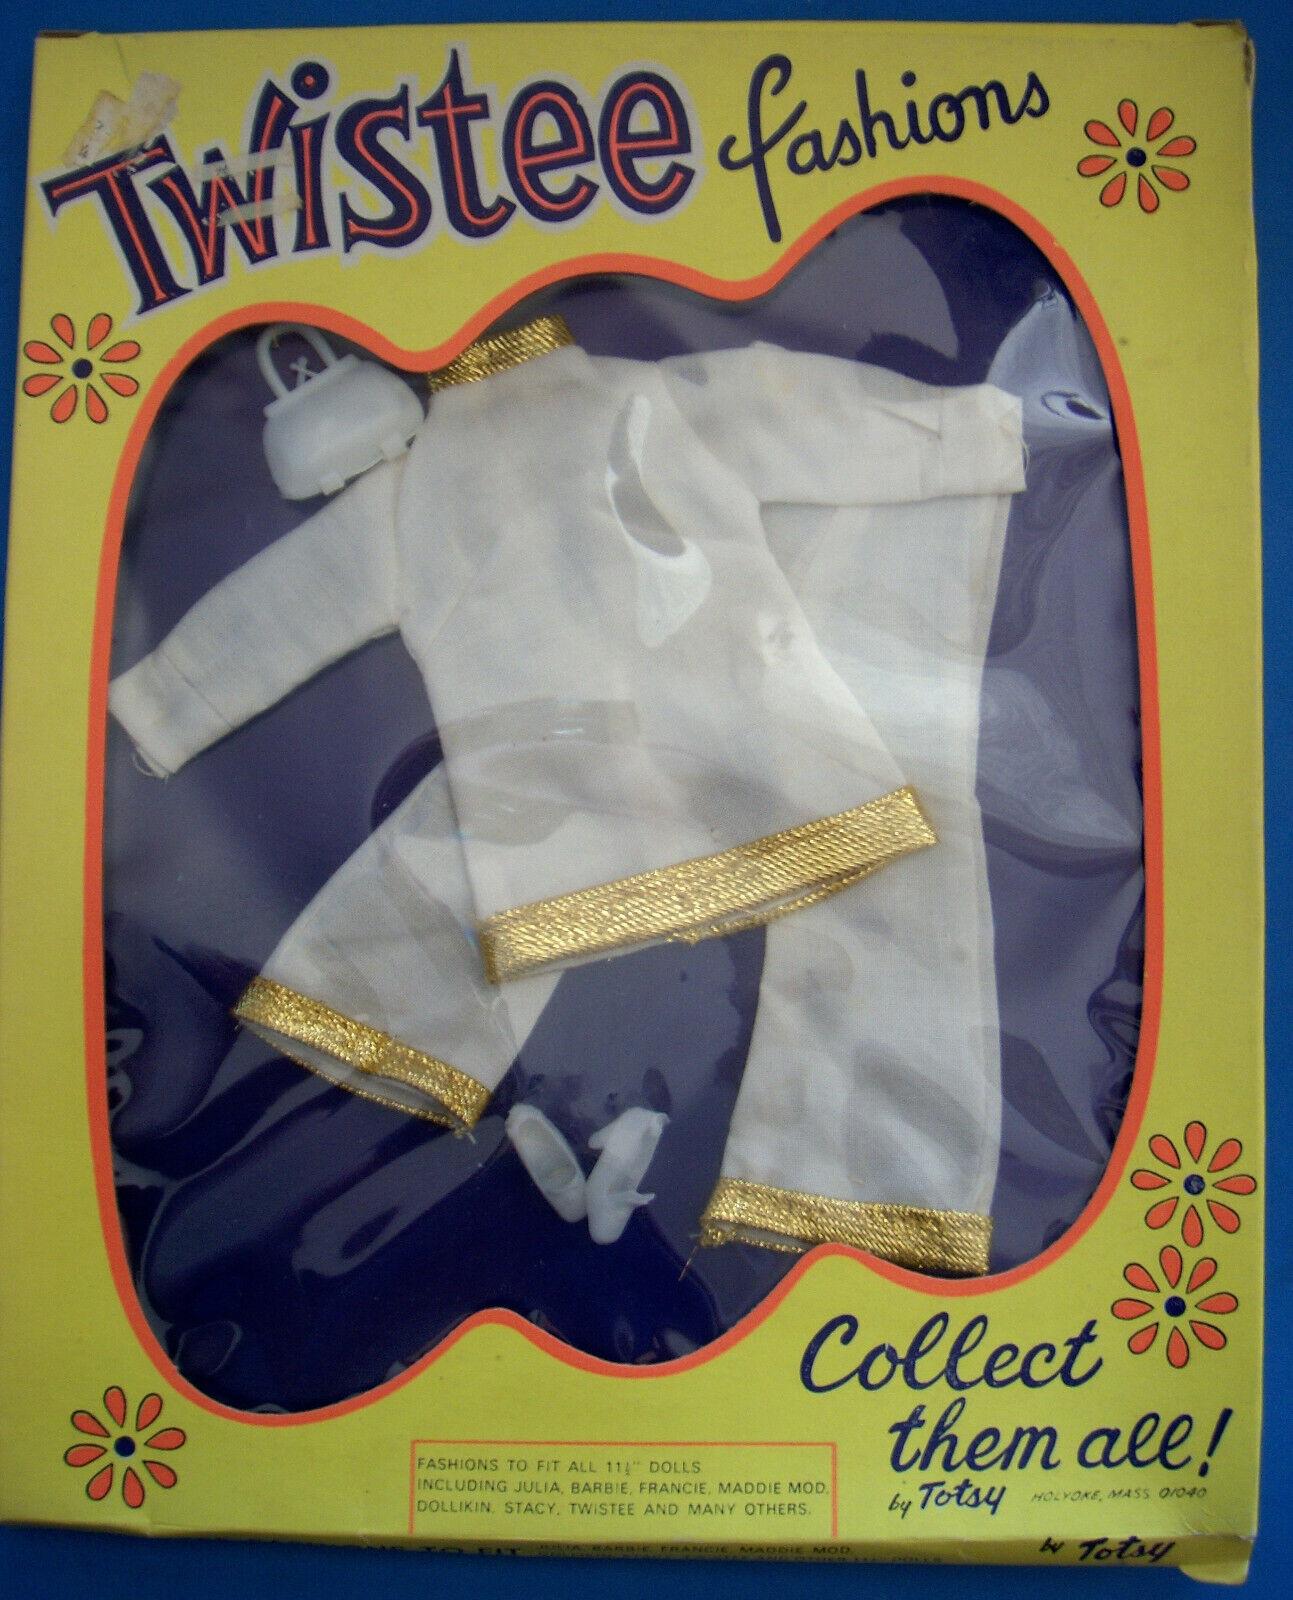 Nrfp Vintage Totsy Twistee modas per 11  1.3cm Bambola Barbie Julia bambolaikin  vendita online sconto prezzo basso